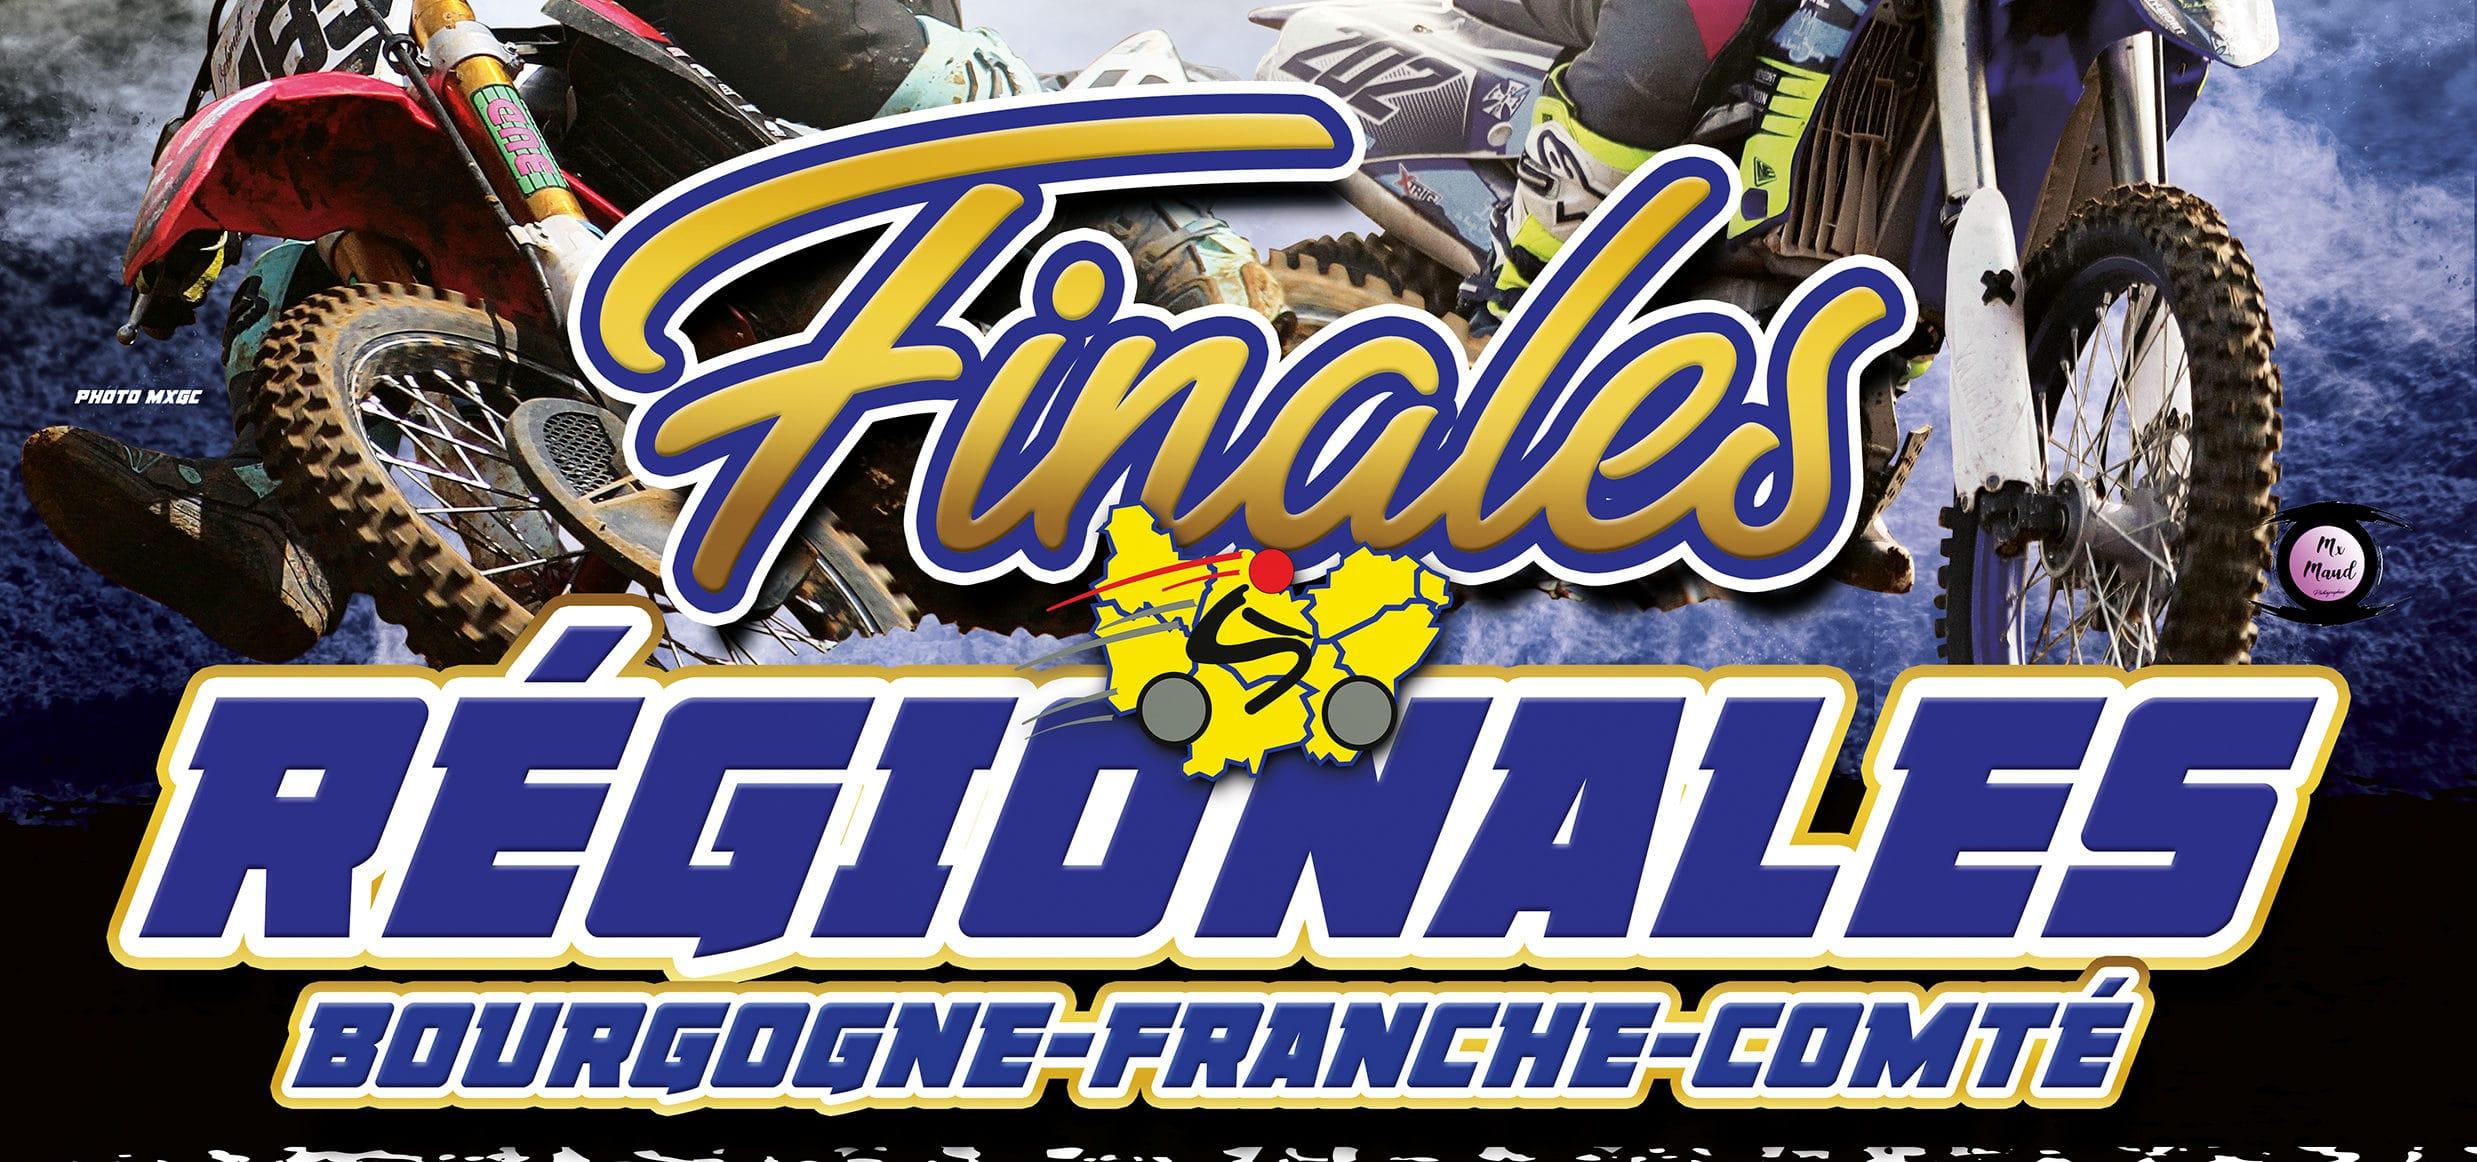 Finale Championnat Bourgogne Franche Comté   MotoClub Dardon Gueugnon